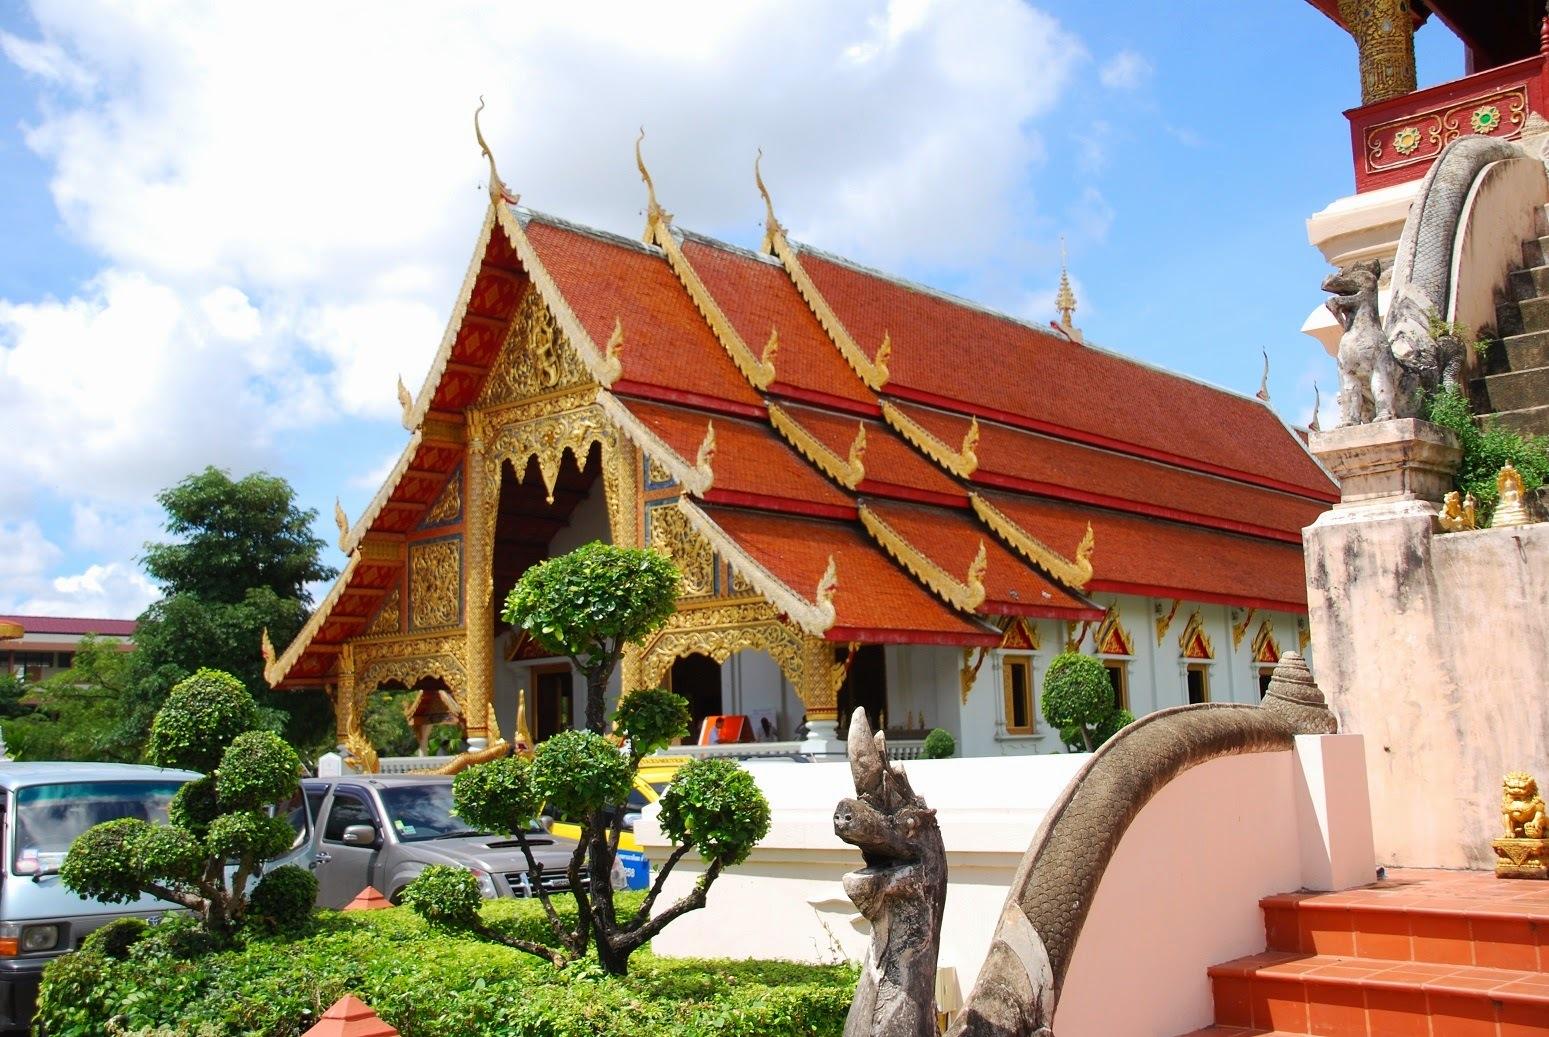 Tajlandia - Chiang Mai